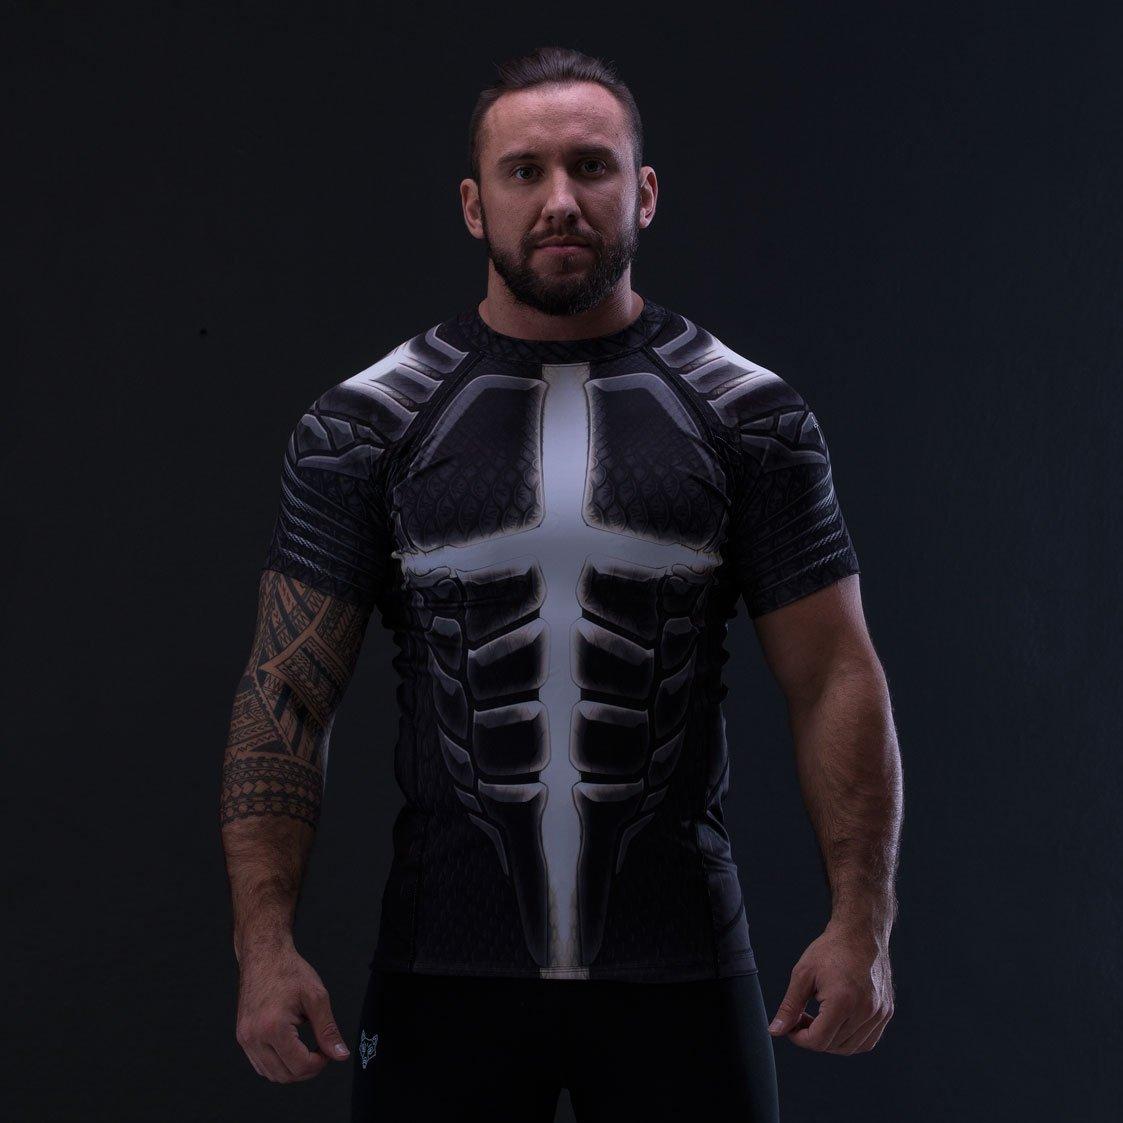 Symbo T-Shirt Herren Rashguard Zouaves of Death thermoaktiv Kompression Stretch Sport Fitness Training Kampfsport